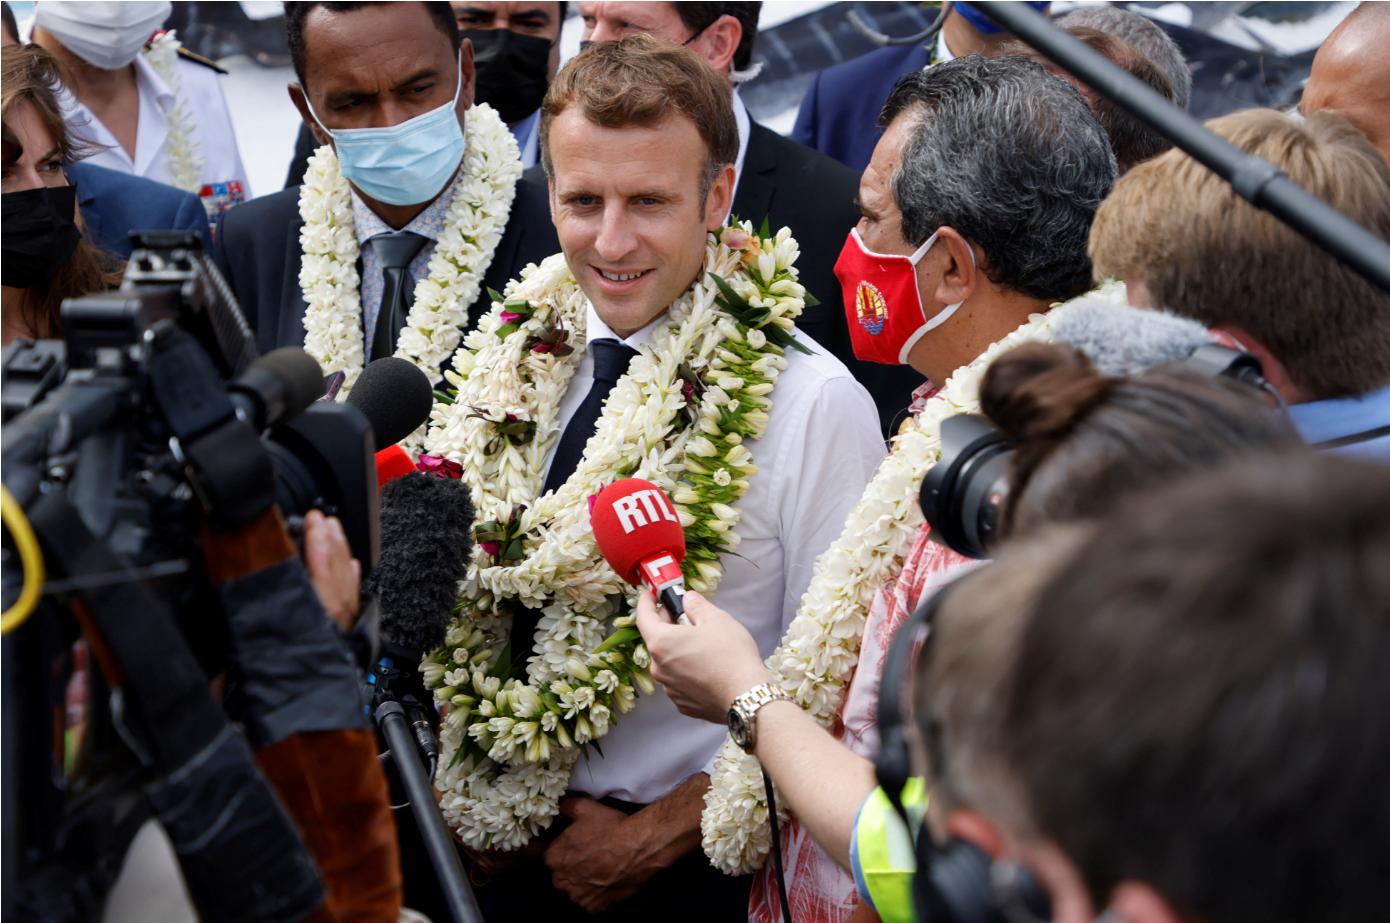 Crédit photo : AFP - Ludovic Marin